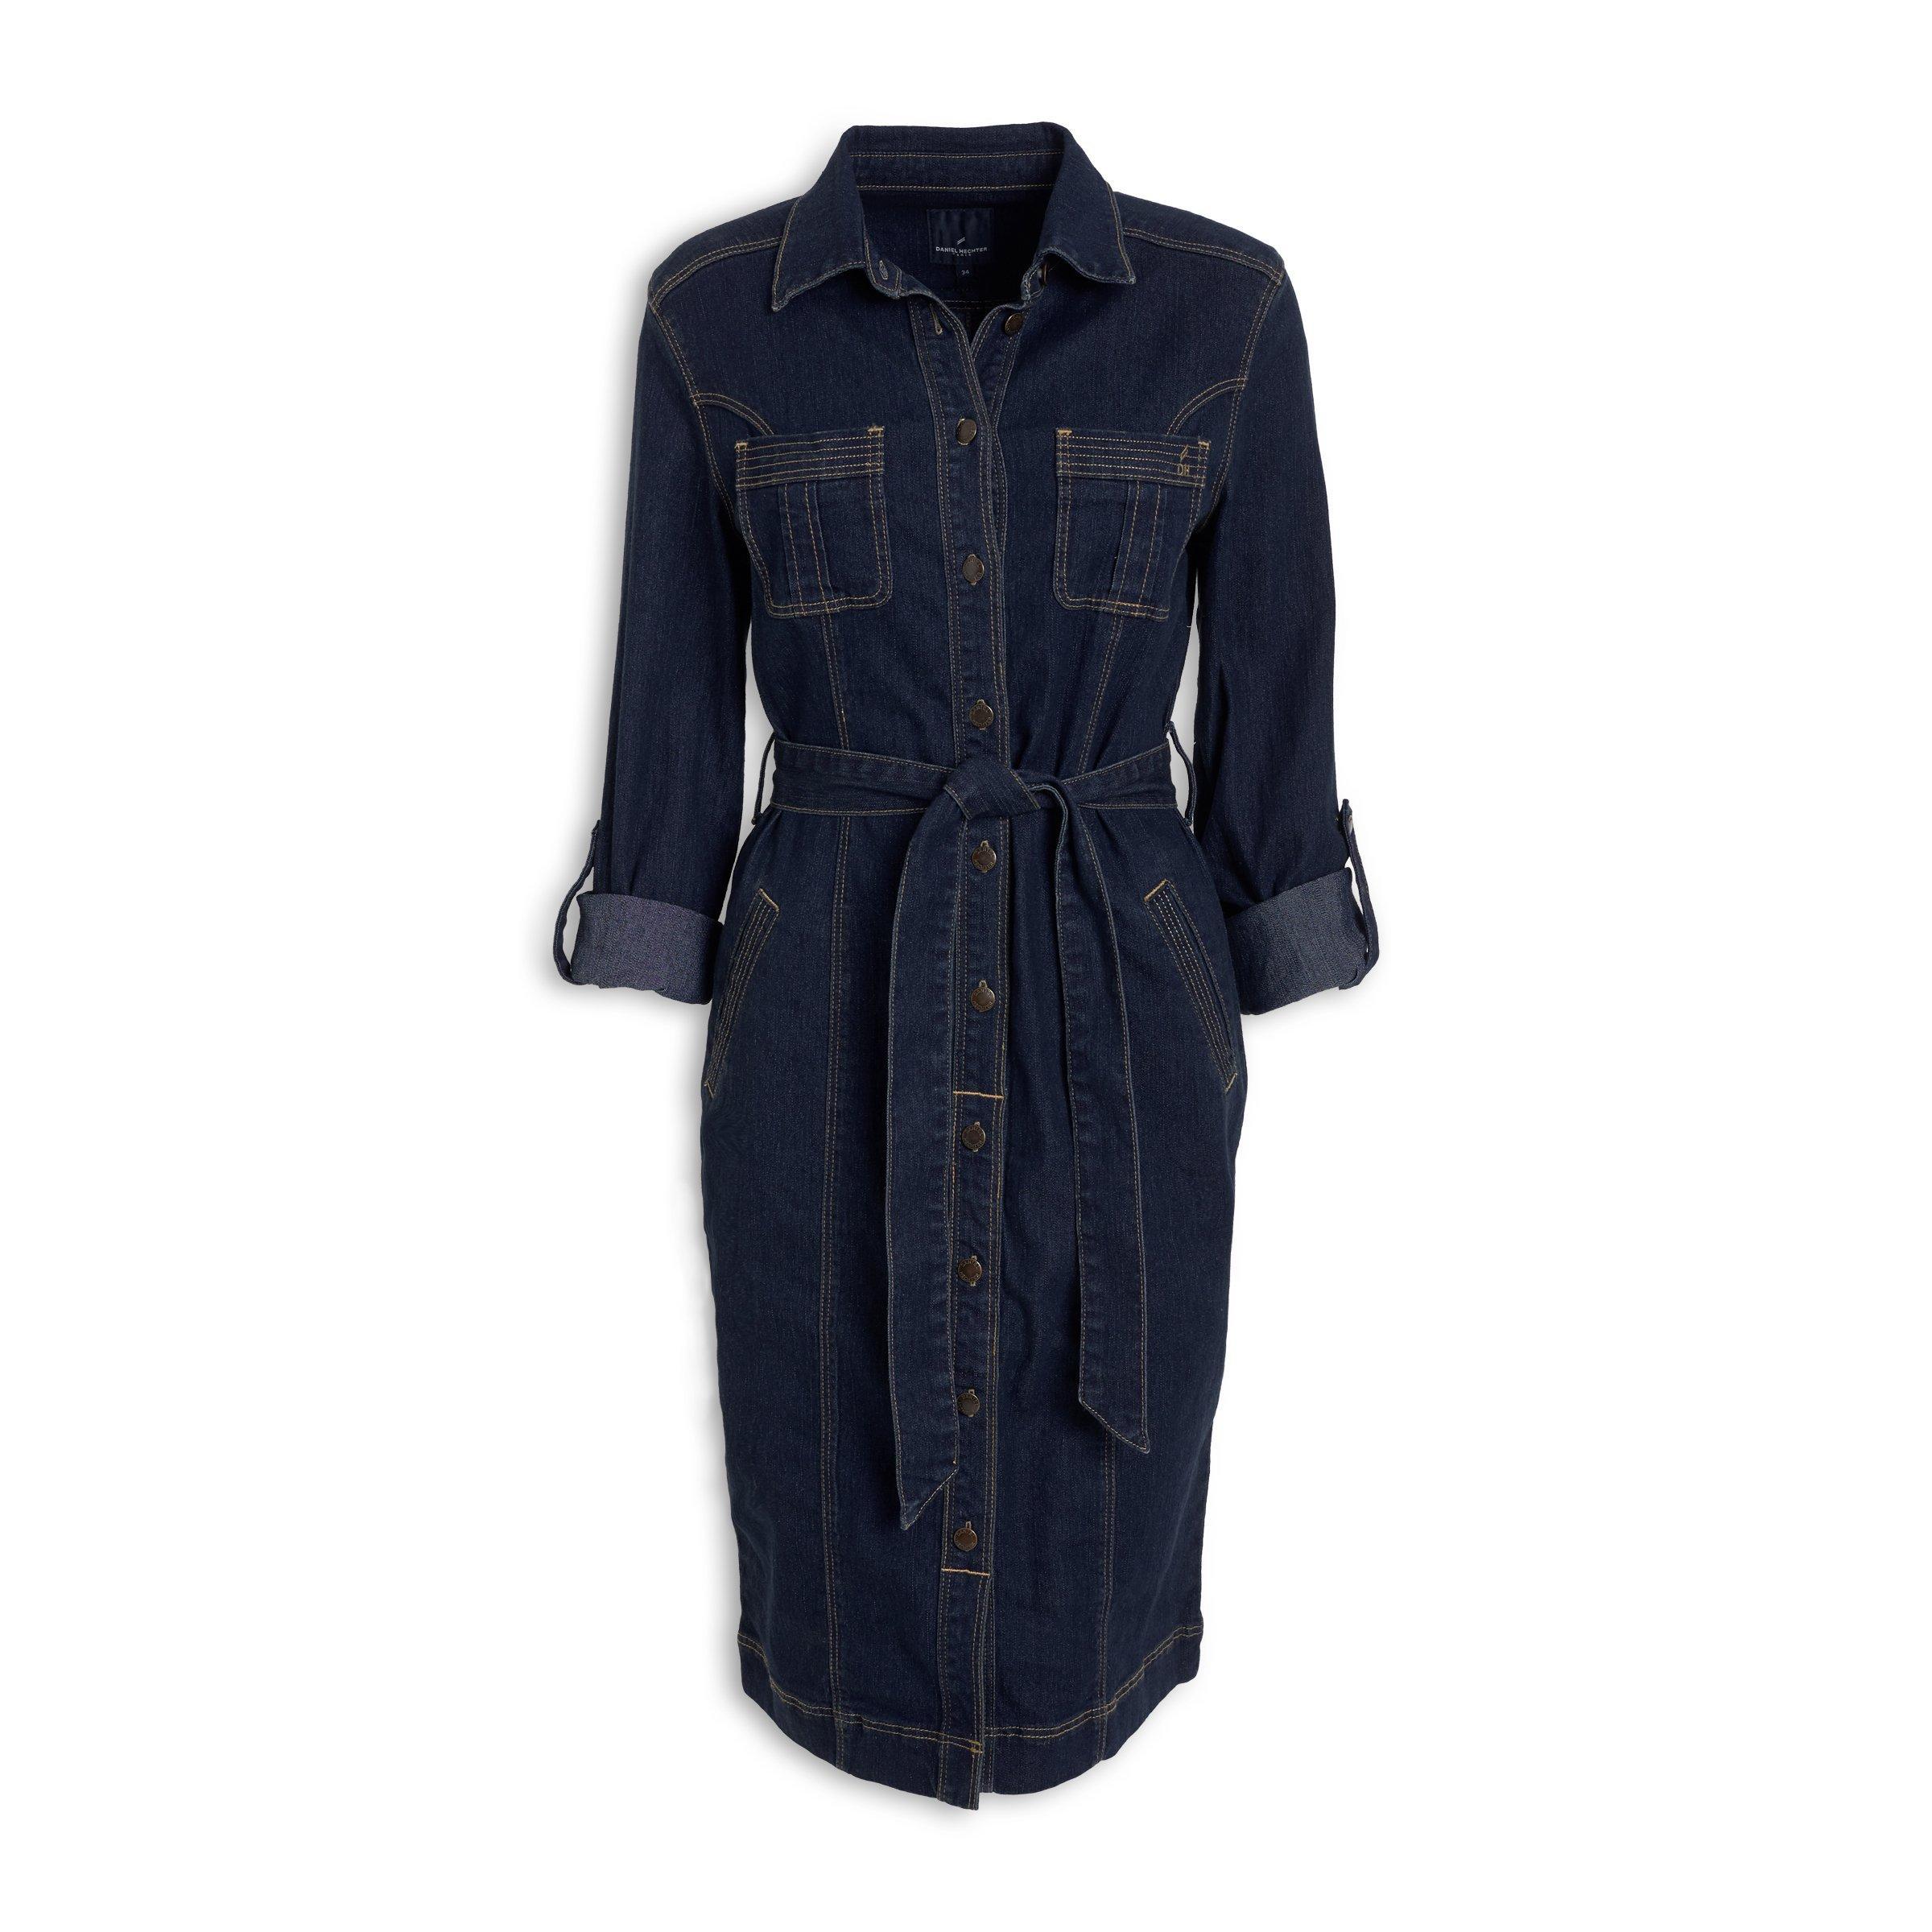 dbe6df7f790 Denim Belted Shirtdress